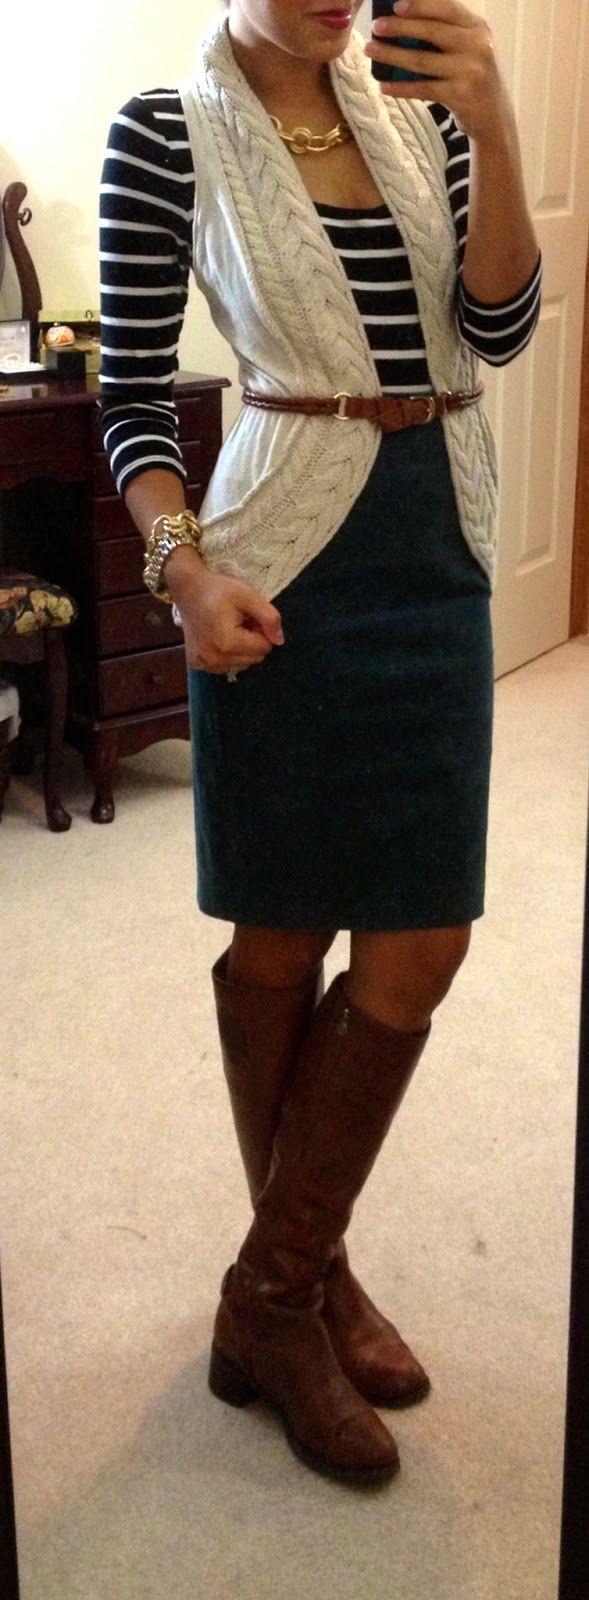 JCrew corduroy pencil skirt worn over F21 striped dress, Banana Republic sweater vest, Etienne Aigner costa boots, H belt, NY watc